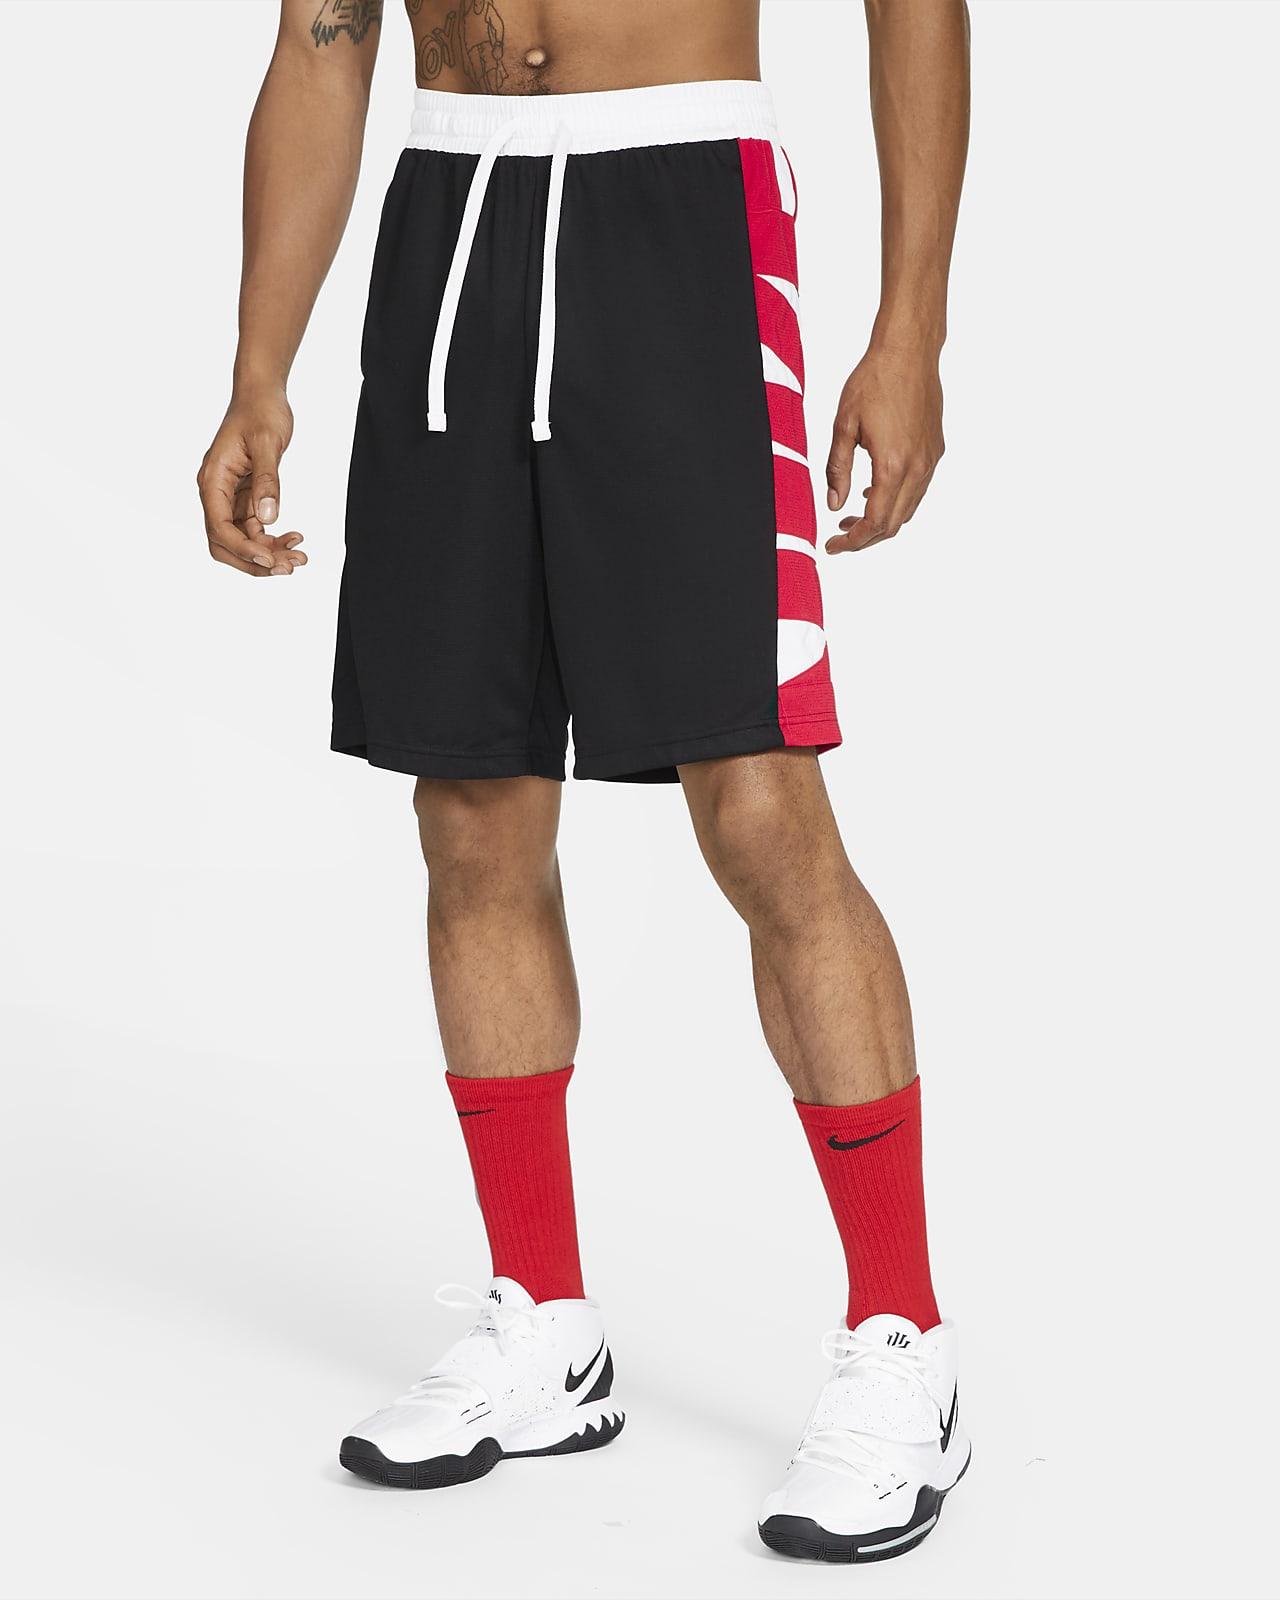 Nike Dri-FIT Herren-Basketballshorts